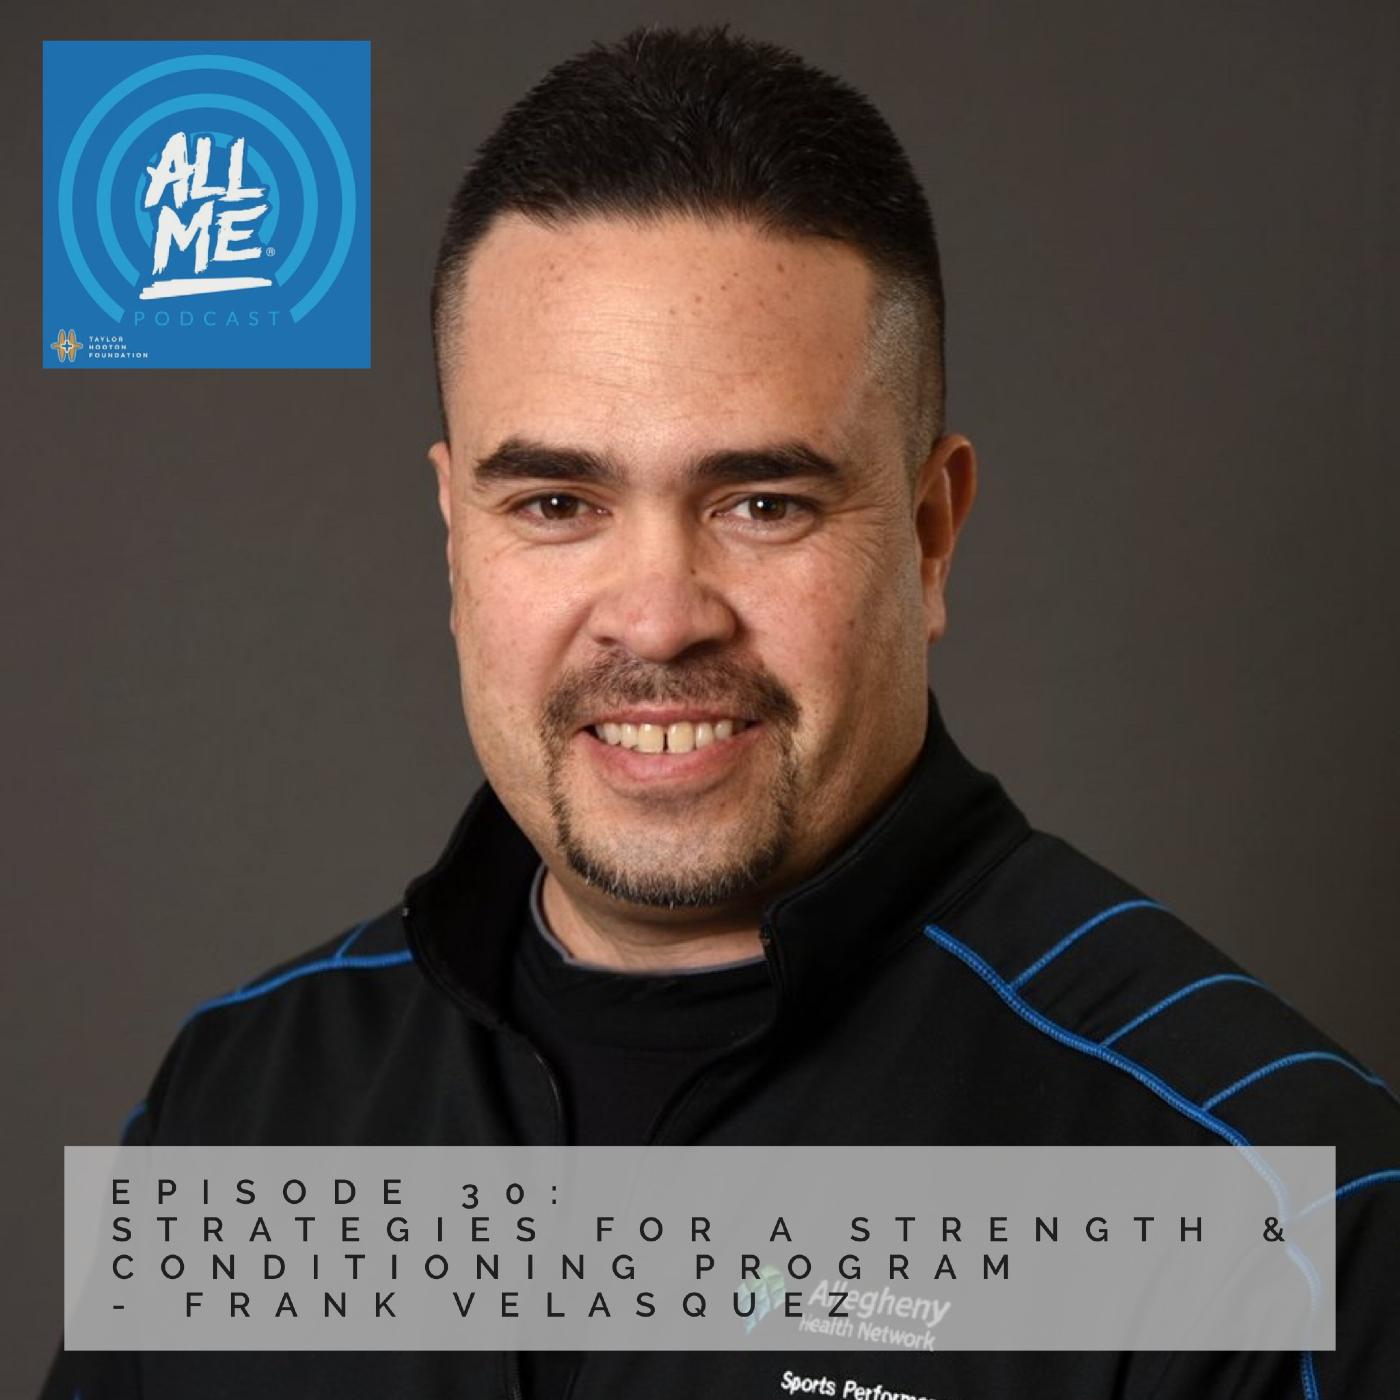 Episode 30: Strategies for a Strength & Conditioning Program - Frank Velasquez